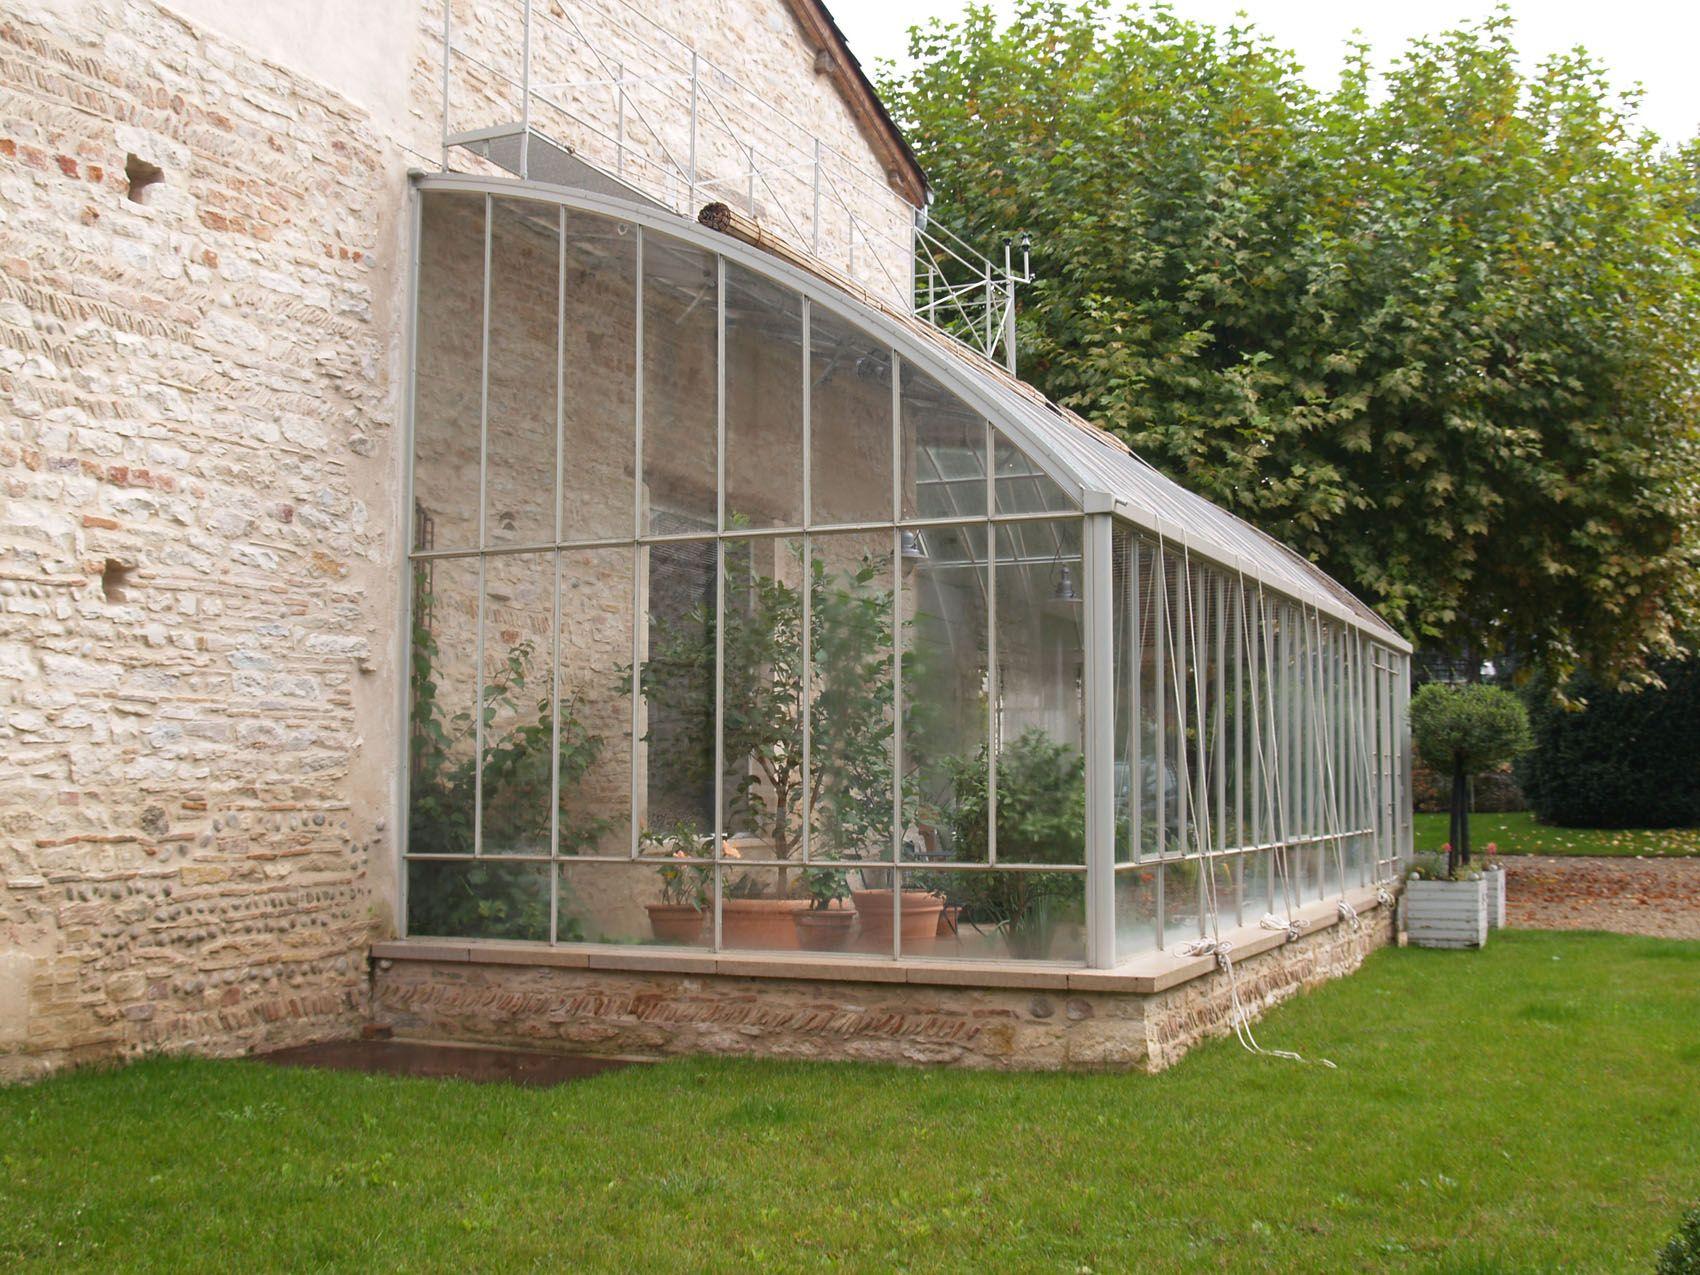 Best 25 Serre Adossã E Ideas On Pinterest Cabane Jardin La ... concernant Serre De Jardin Ancienne A Vendre